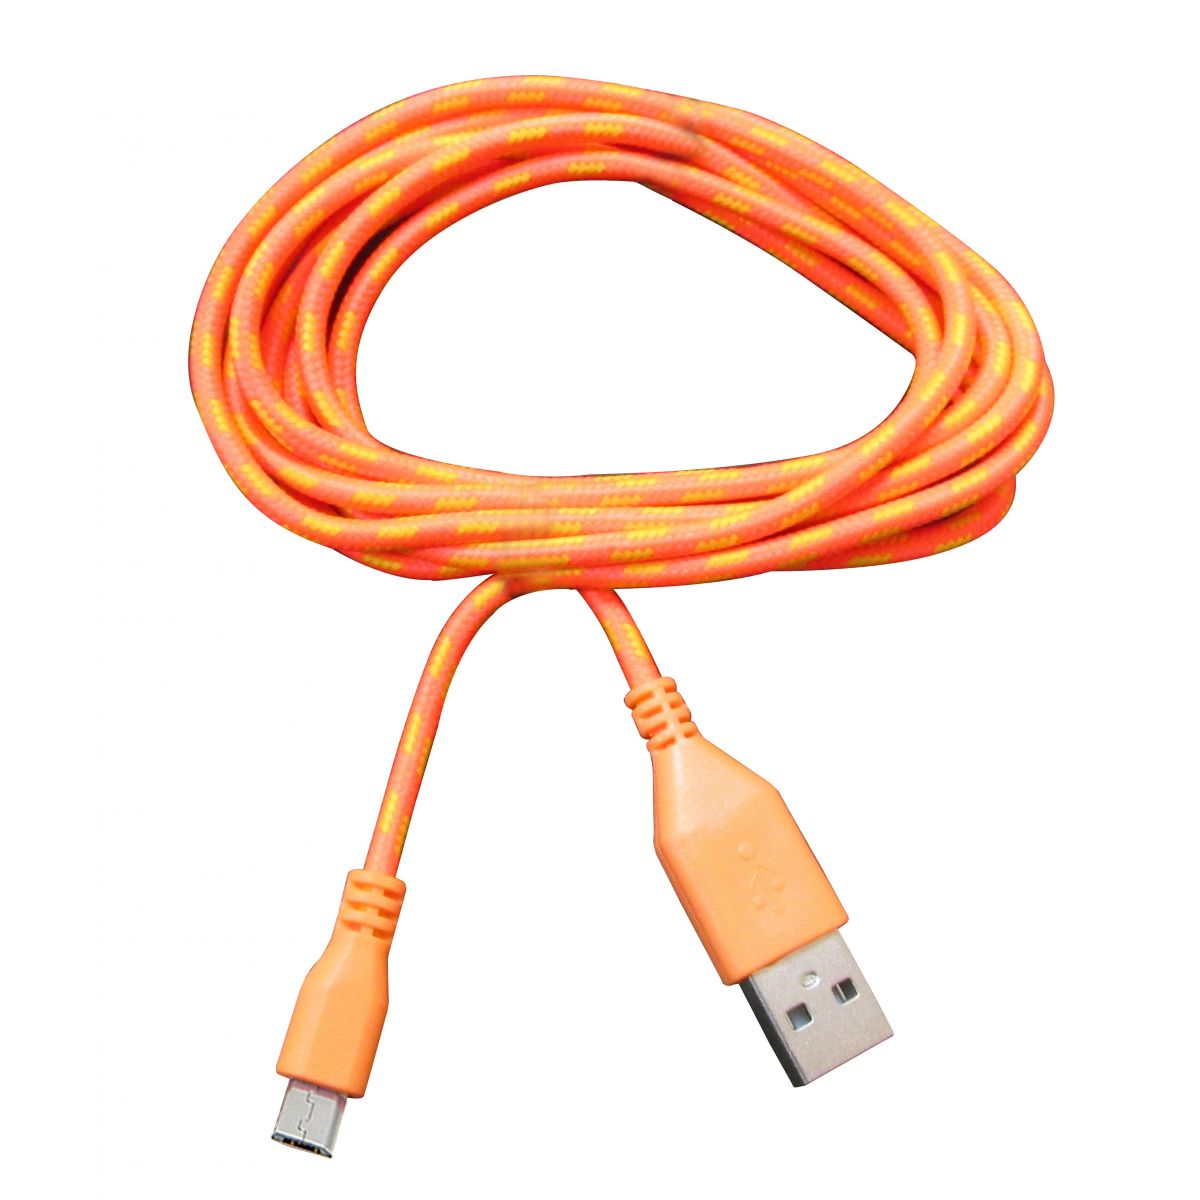 Cabo de Dados Estilo Corda Micro USB 3 Metros - Laranja